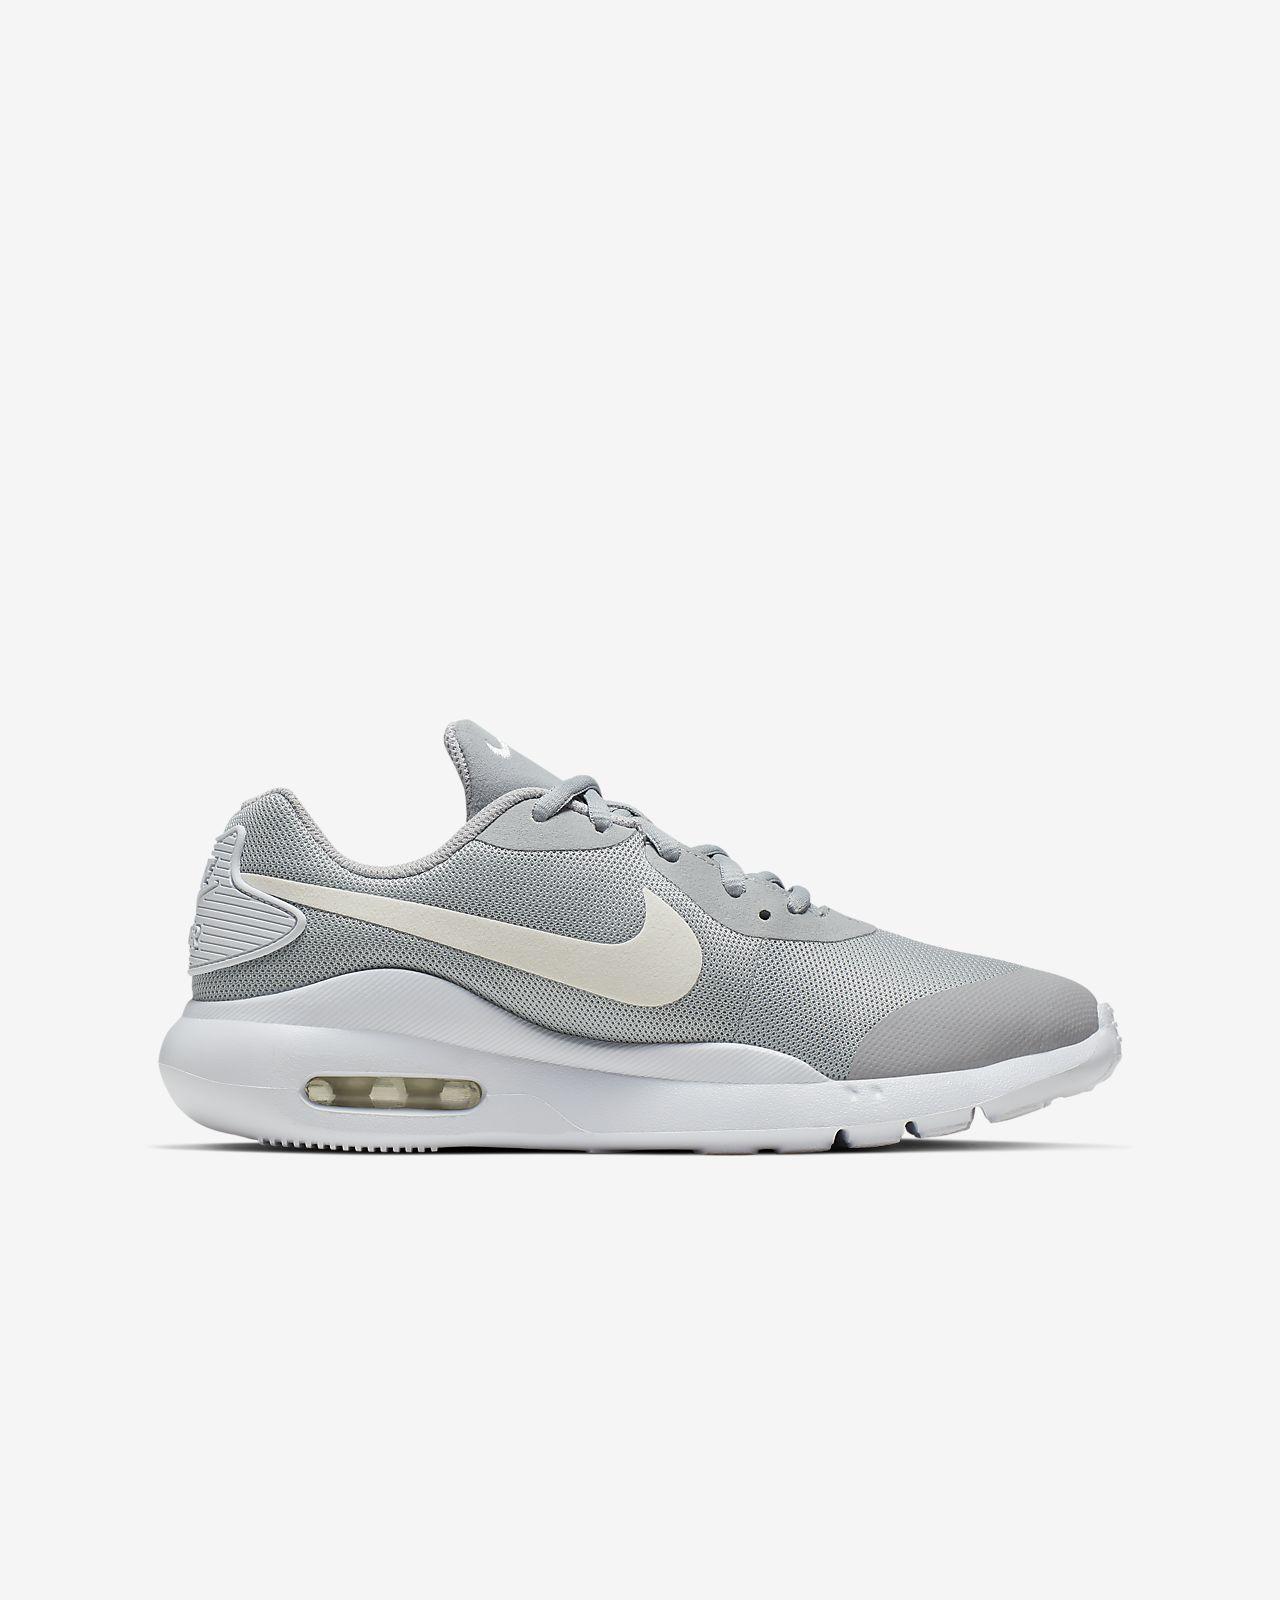 Nike Air Max Oketo Schuh für ältere Kinder